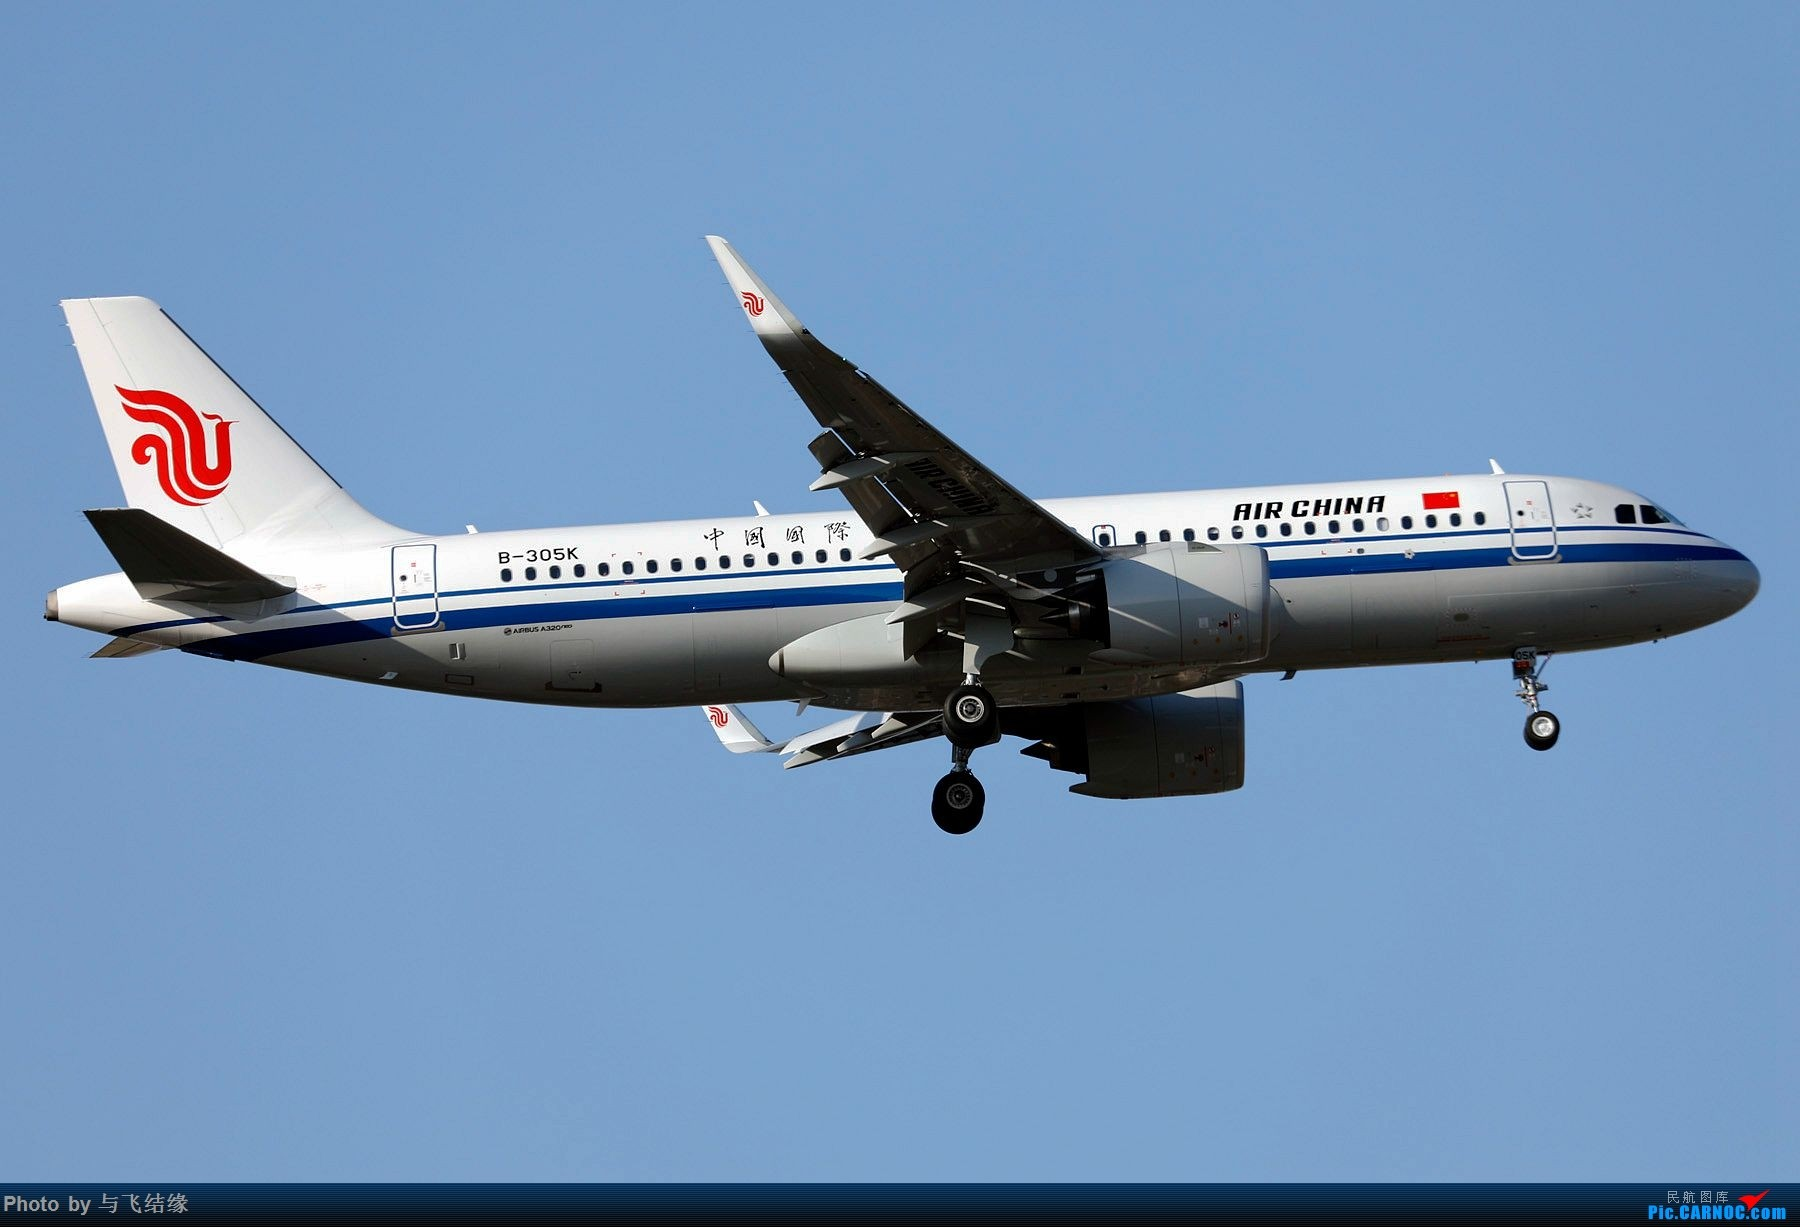 Re:[原创]新年第一贴,2019年诸事顺利。 AIRBUS A320NEO B-305K 中国北京首都国际机场